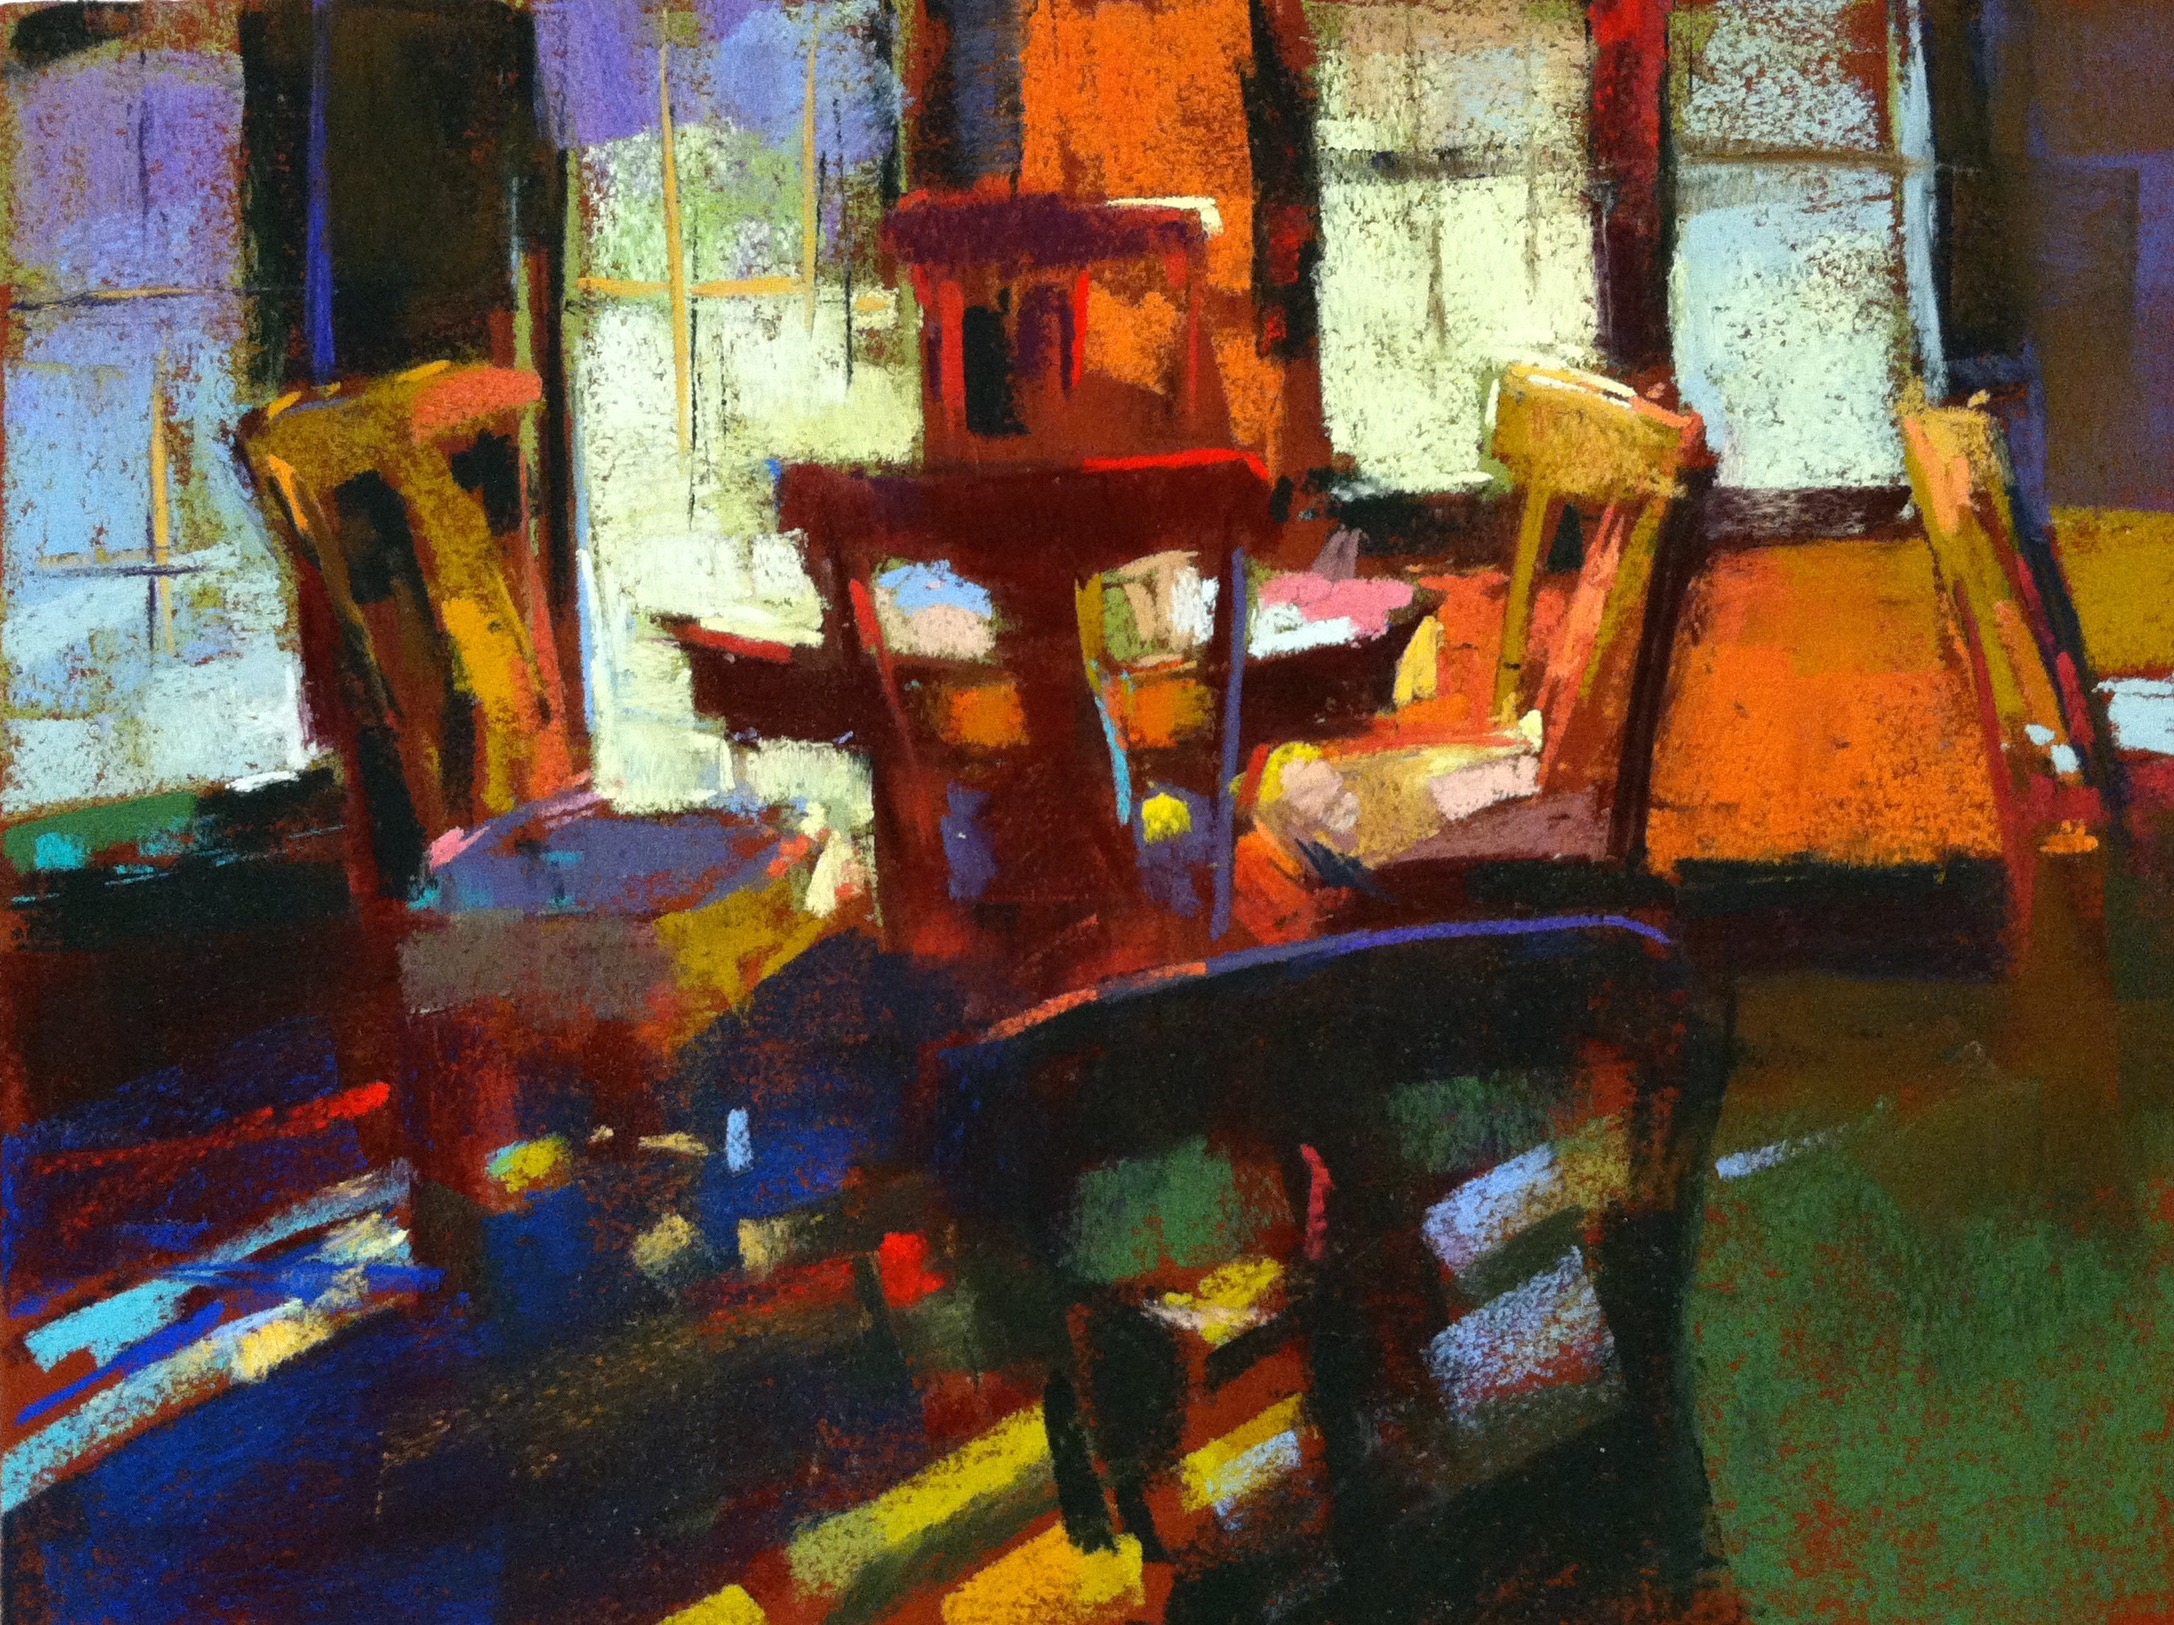 Chairs  9 x 12